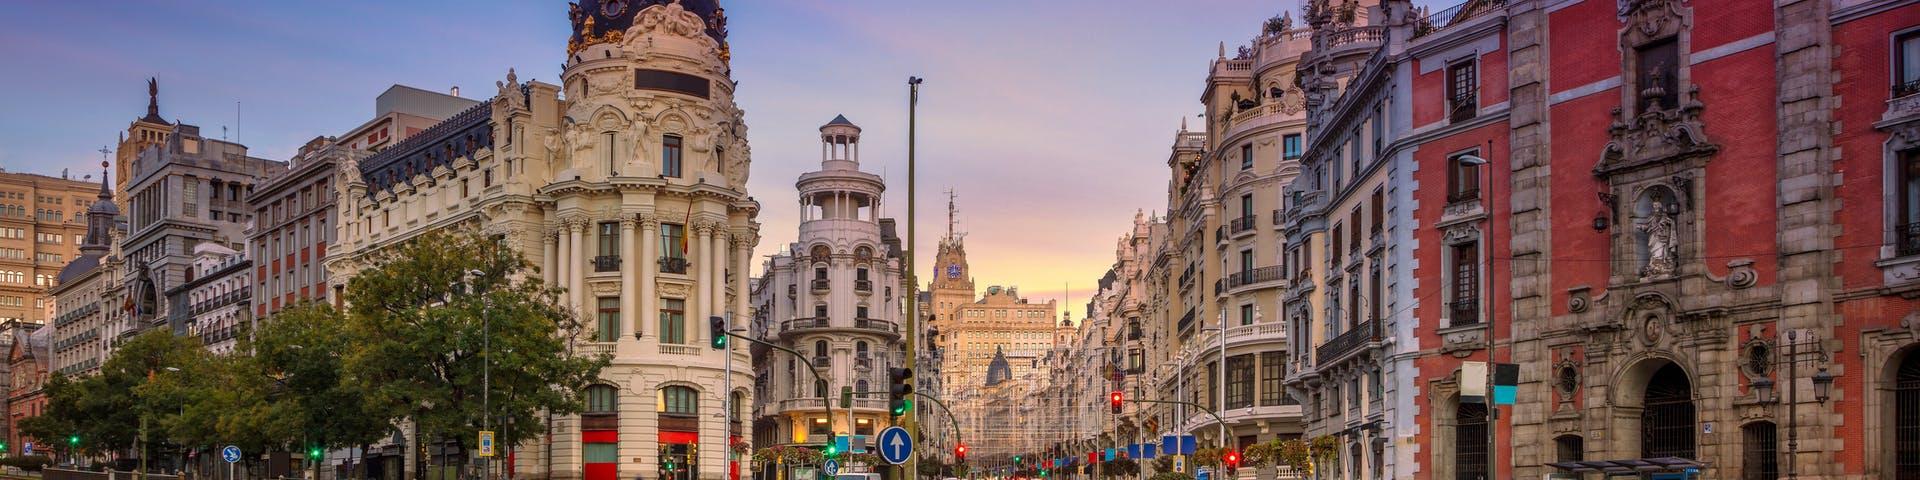 1556807850 shutterstock 518552560c #1 Best Visa Consultant for Study in Spain